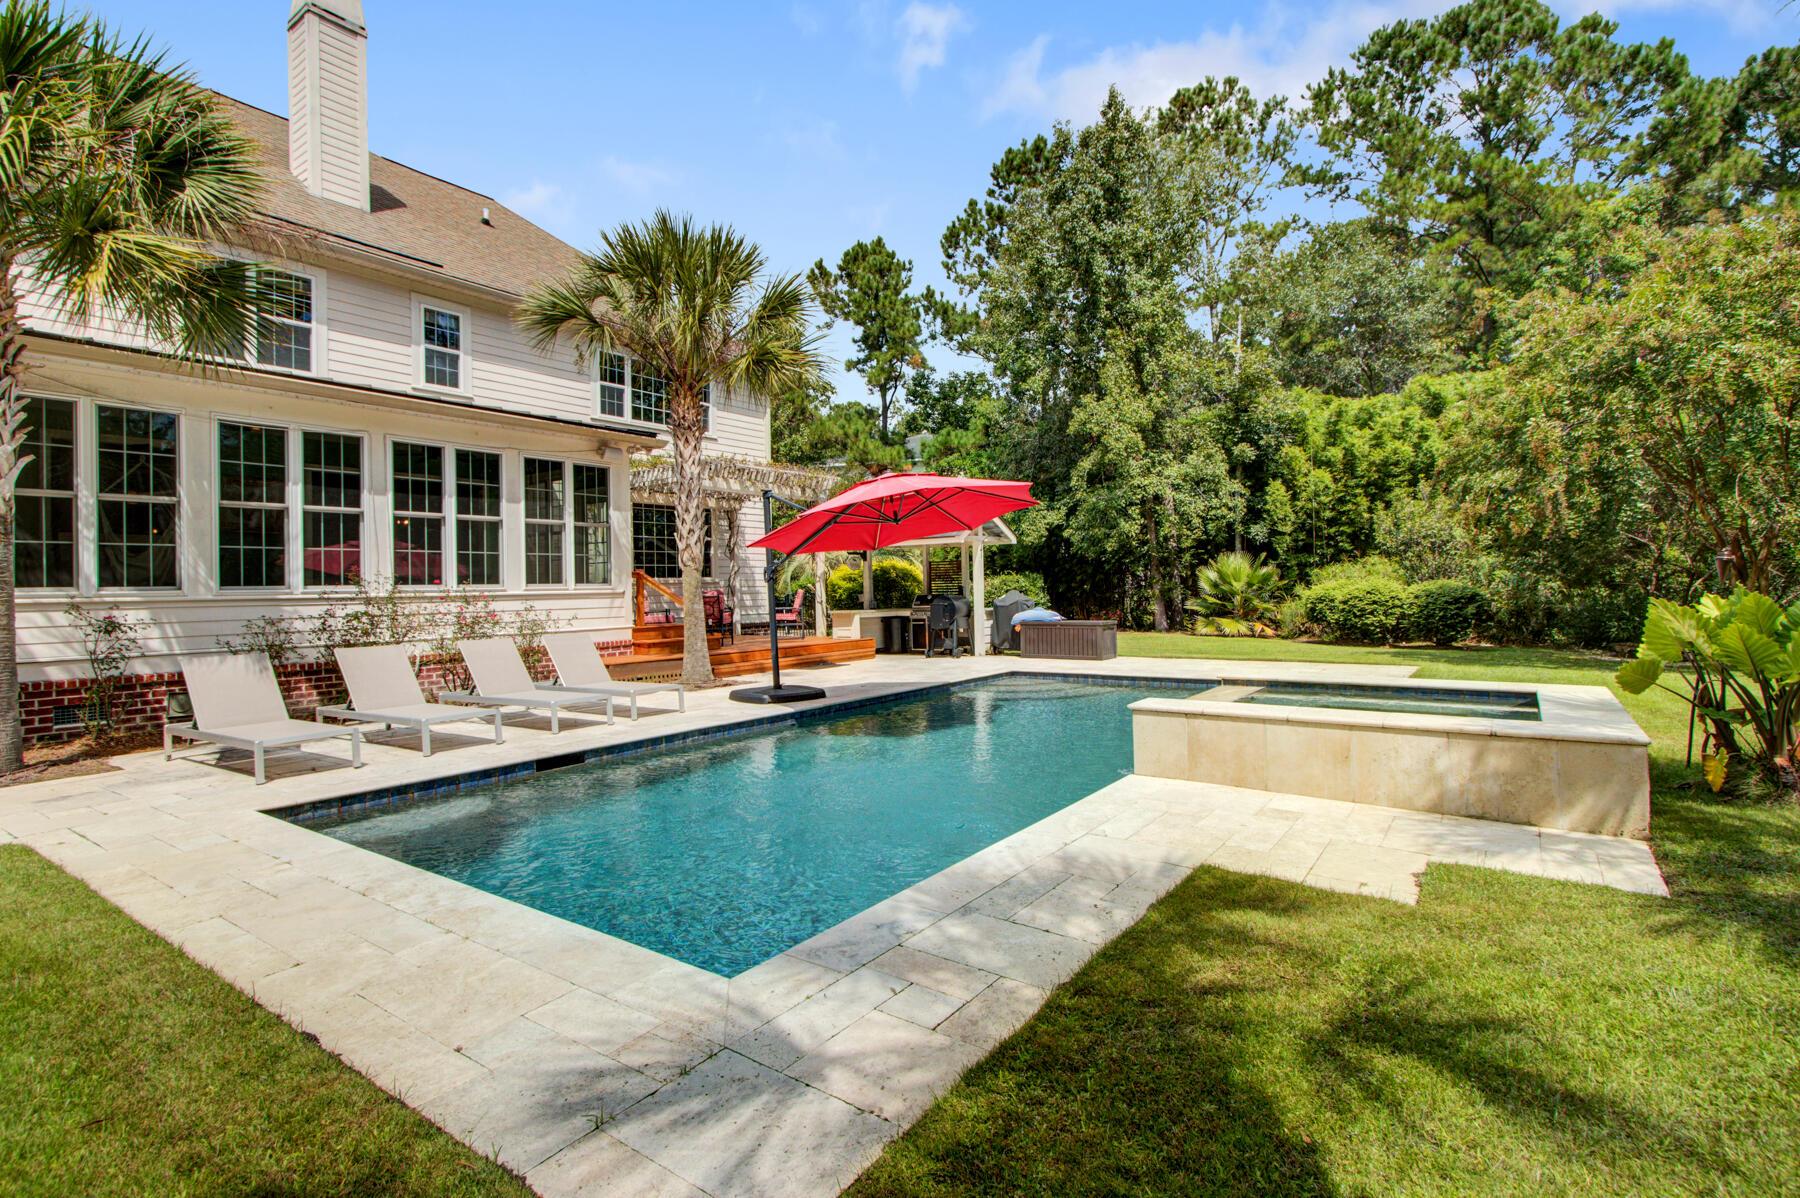 Dunes West Homes For Sale - 3095 Pignatelli, Mount Pleasant, SC - 7